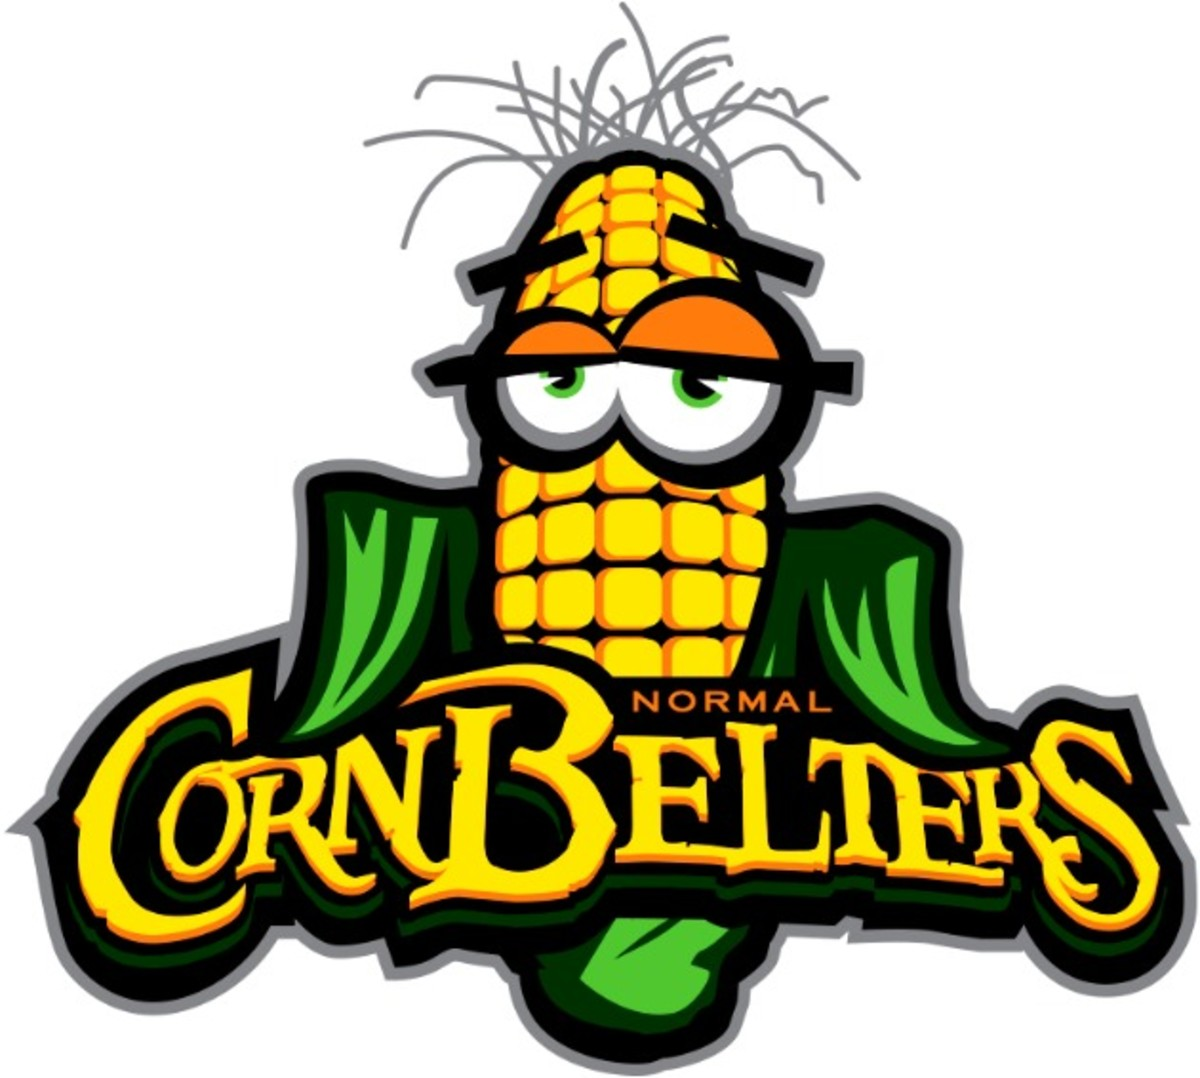 Normal-cornbelters.jpg